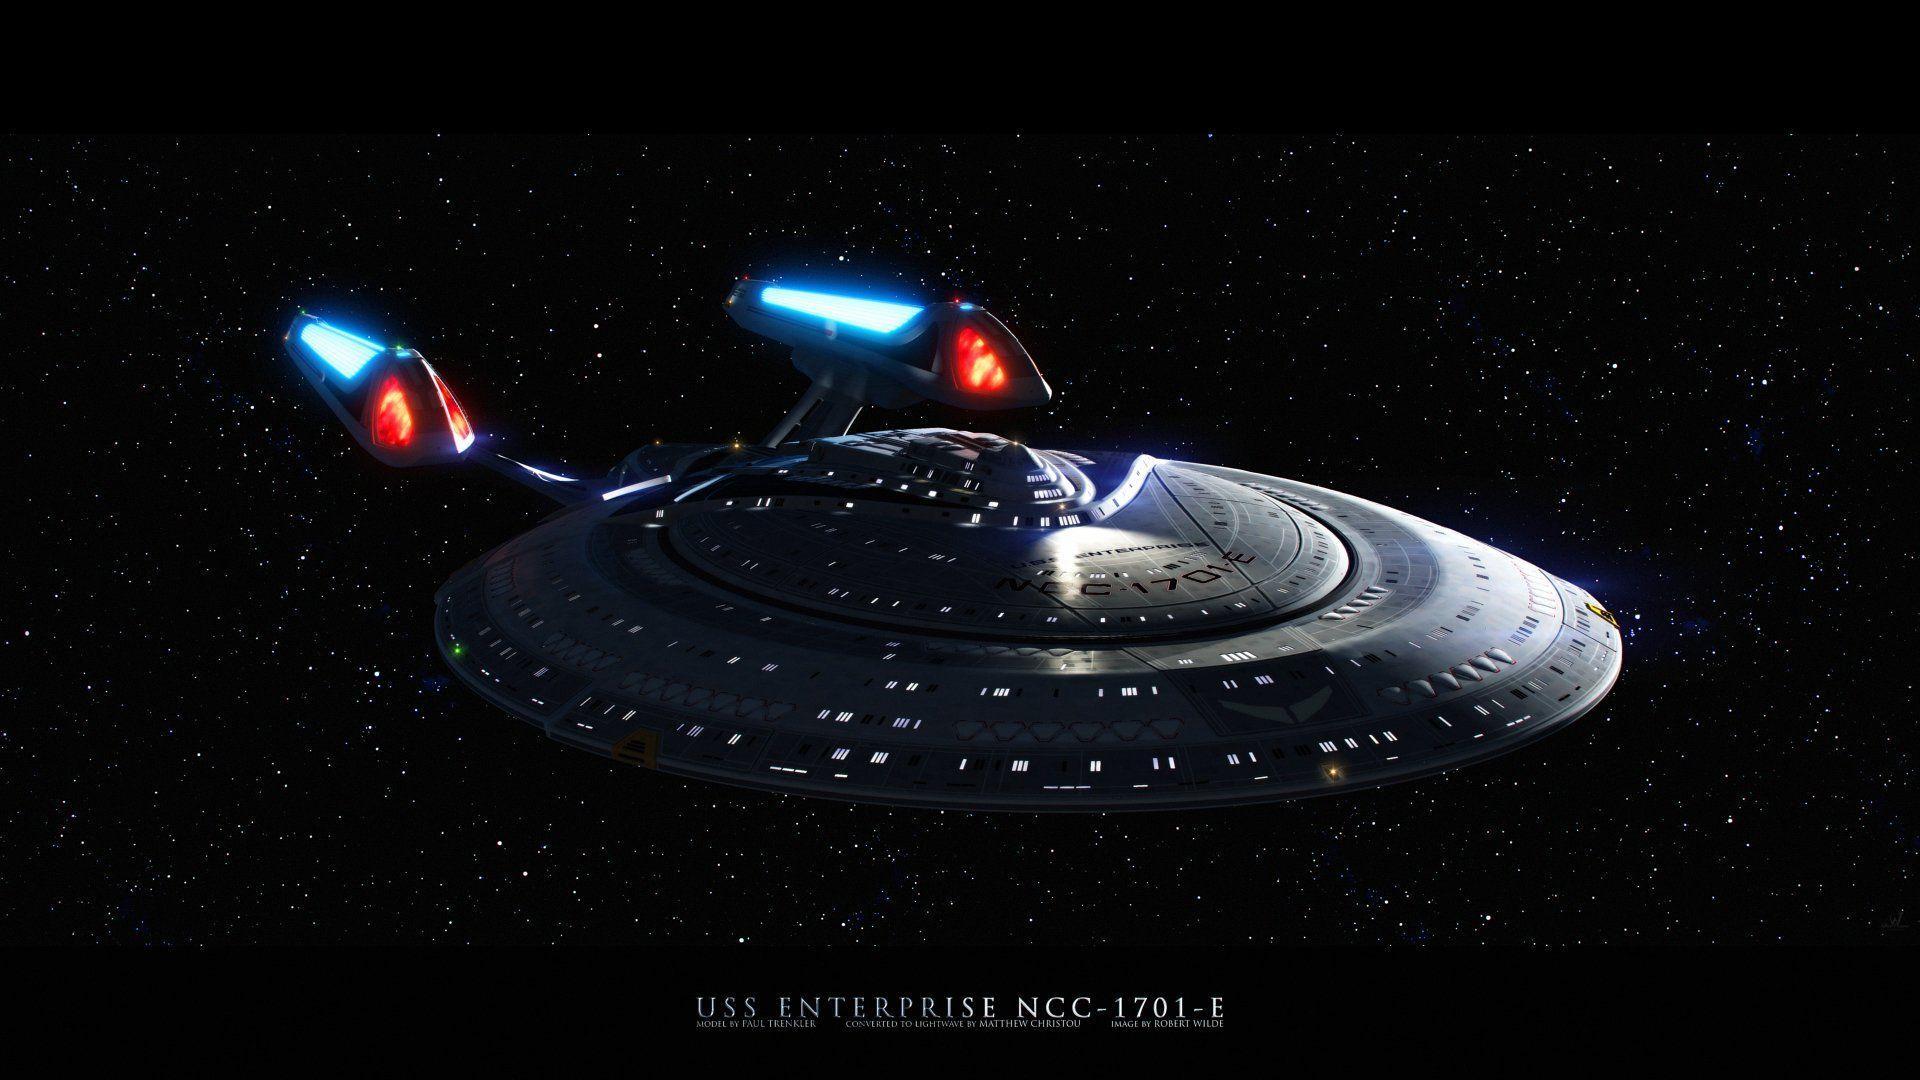 4k Star Trek Wallpapers Top Free 4k Star Trek Backgrounds Wallpaperaccess